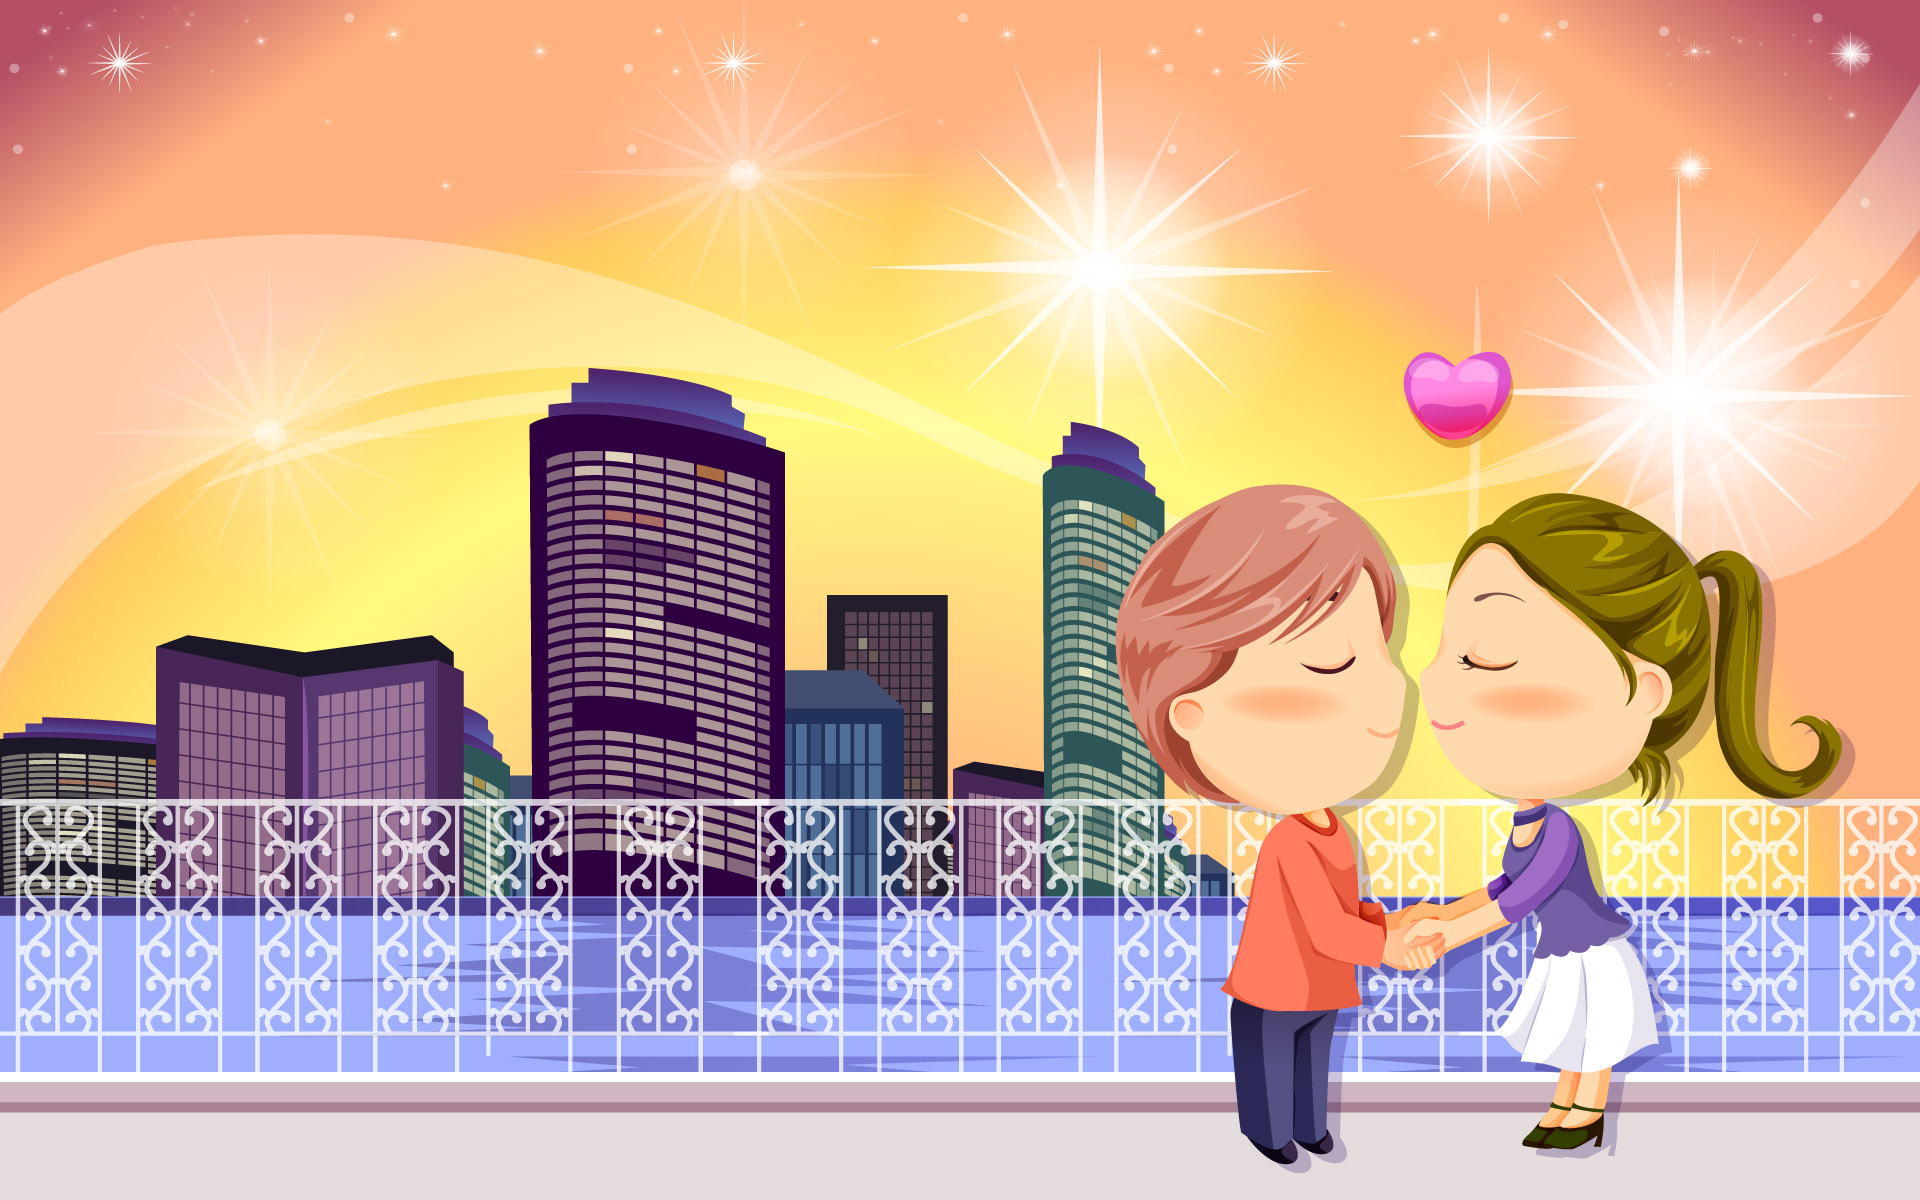 Adorable Love Wallpaper Romantic Cartoon Pic New Hd 366803